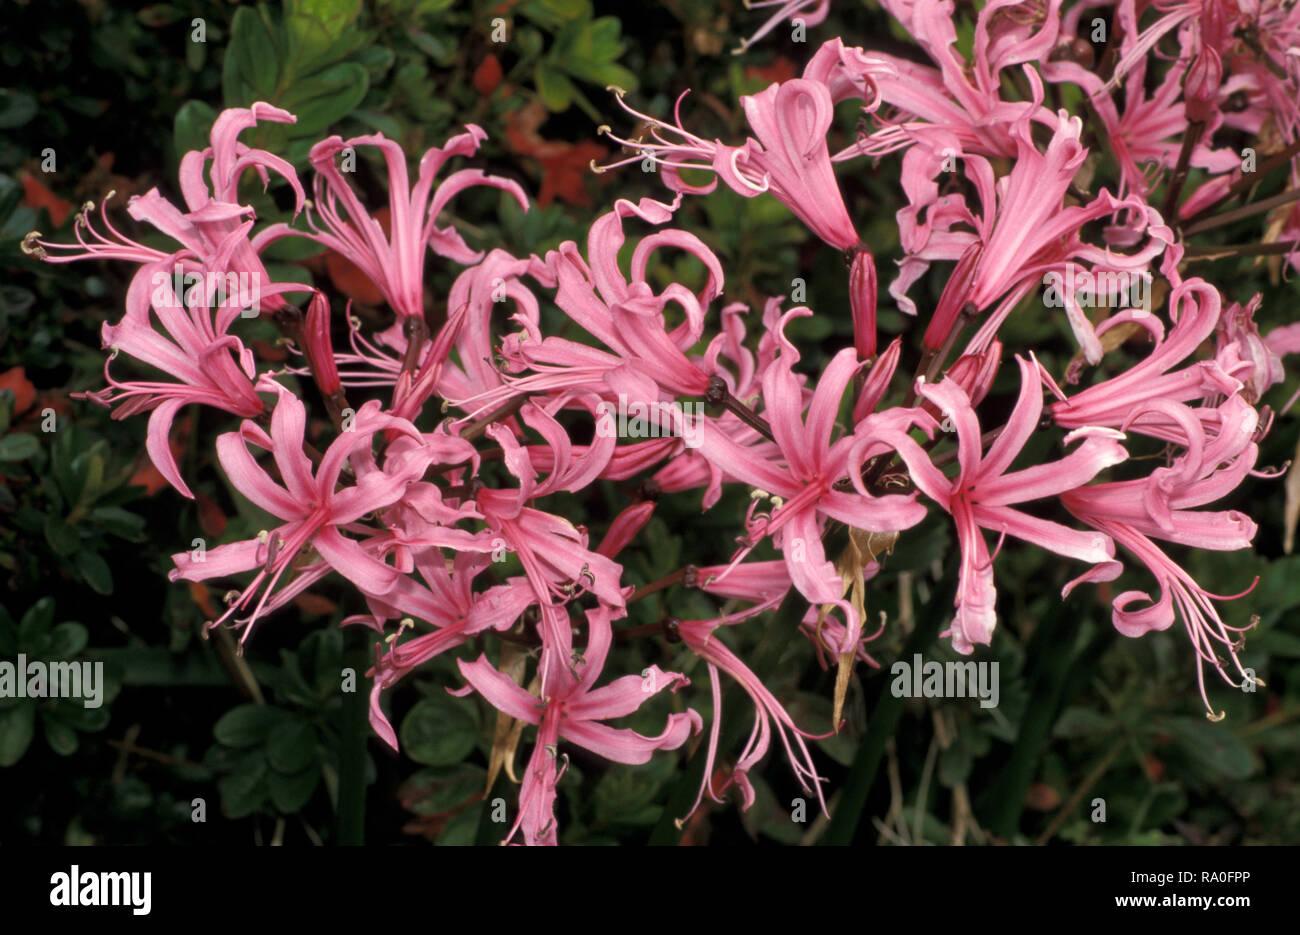 PINK NERINE FLOWERS - Stock Image